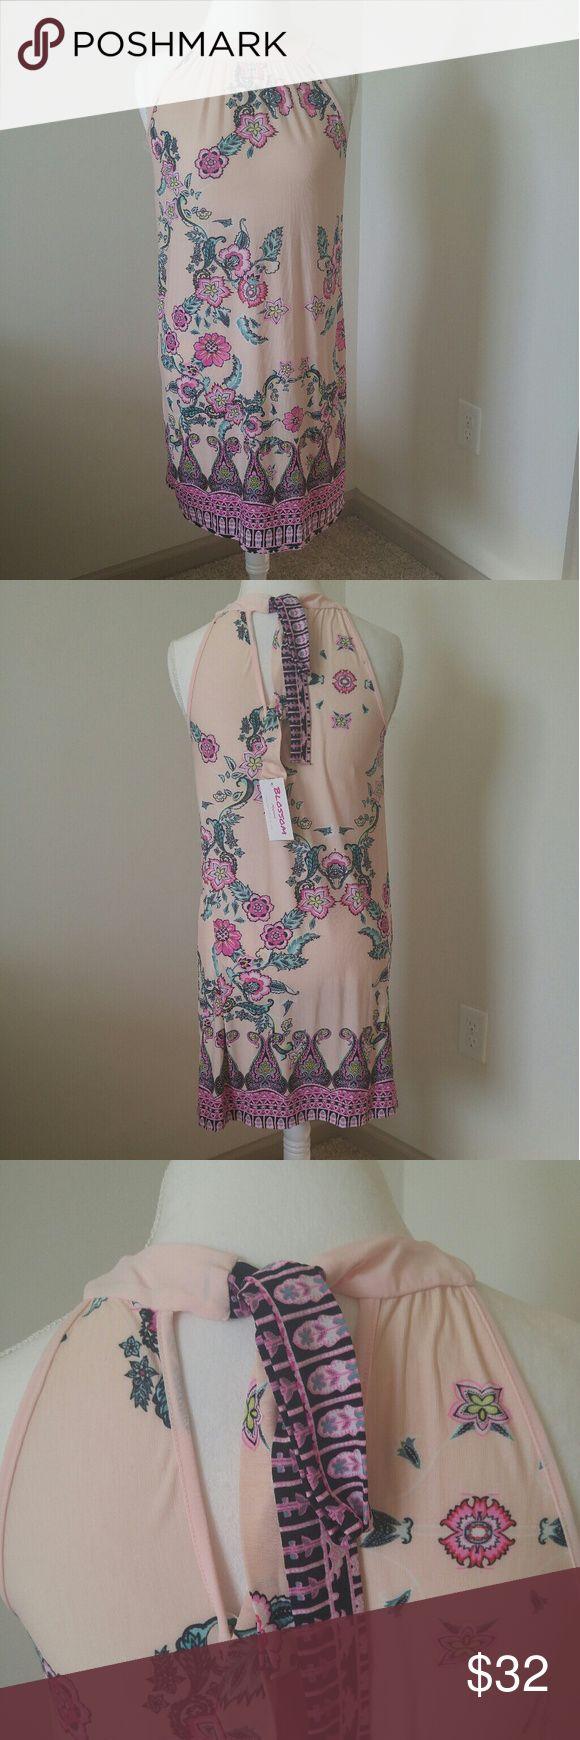 ??JUST IN???Blossom Apparel tie back dress Blossom Apparel tie back dress. SUPER cute dress! Blossom Apparel Dresses Midi